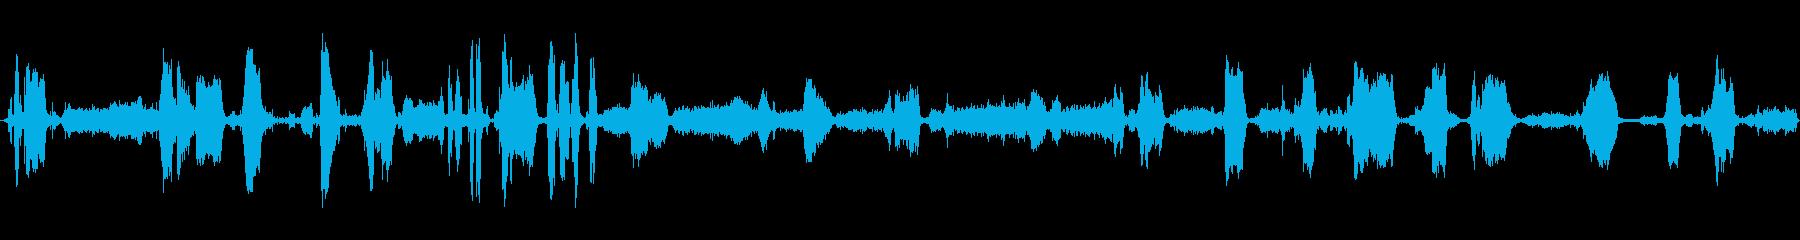 RADIO ACROSS BAND...の再生済みの波形